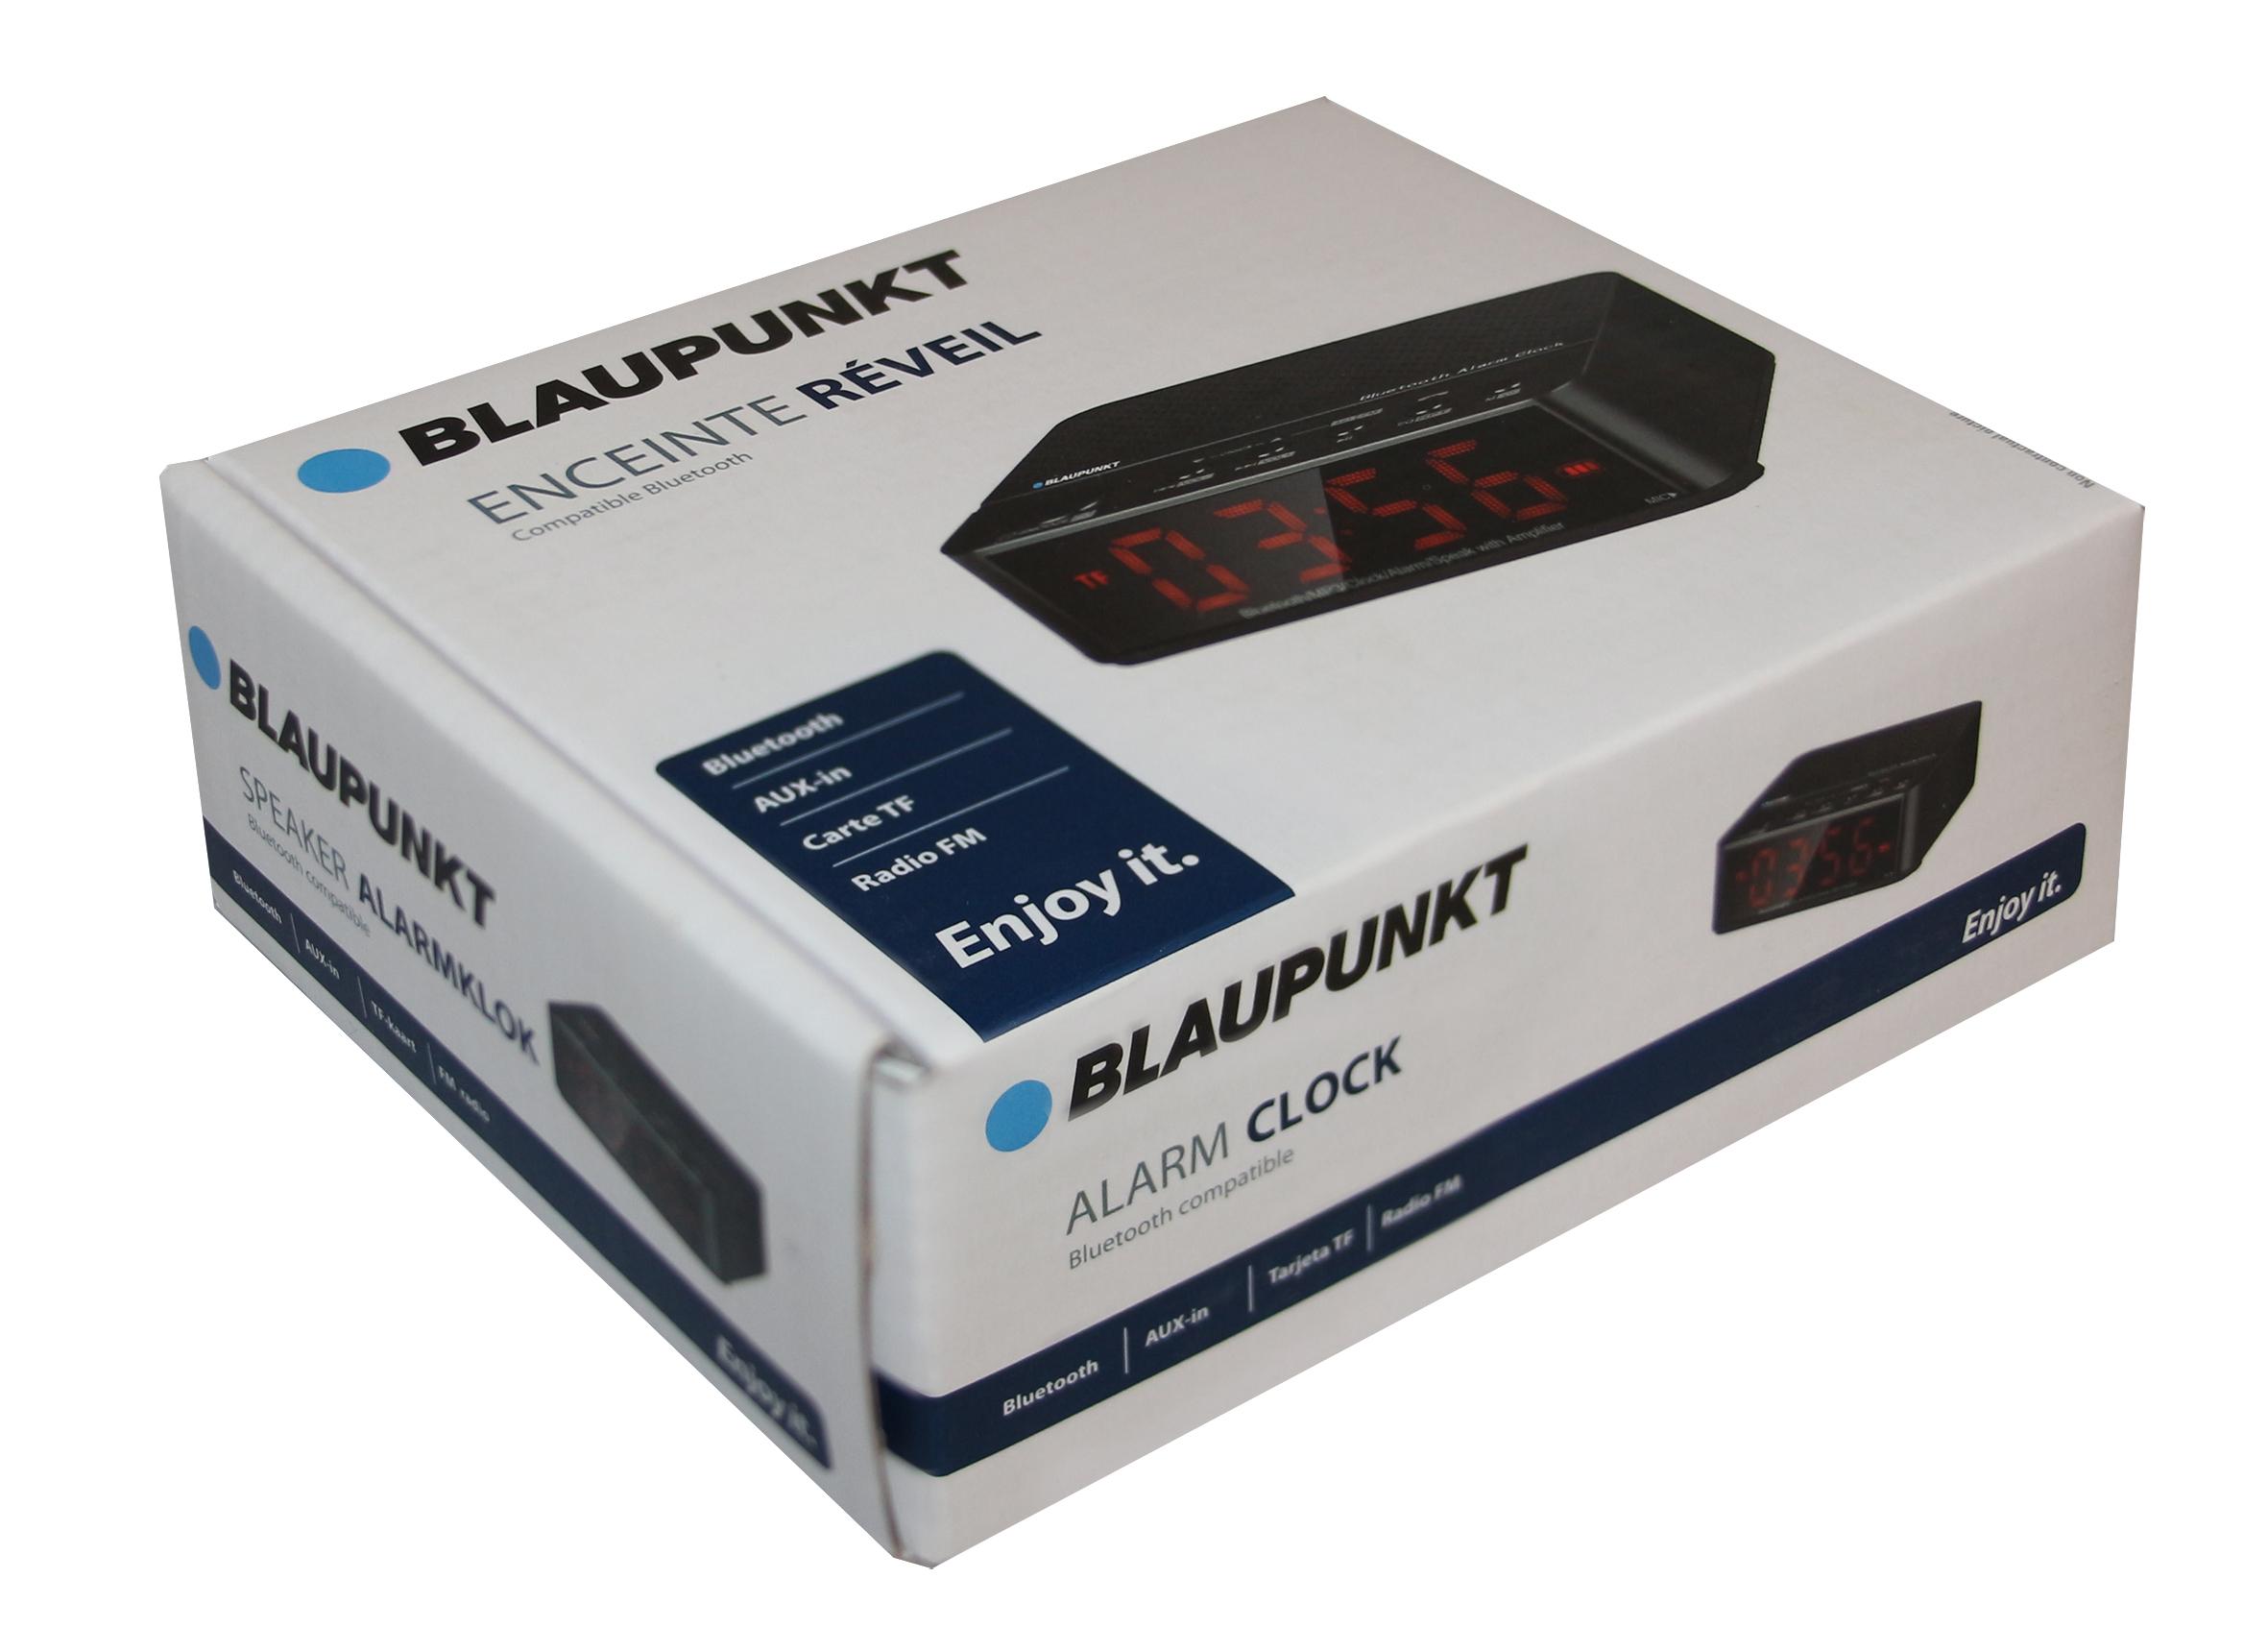 Blaupunkt kelloradio BLP2100